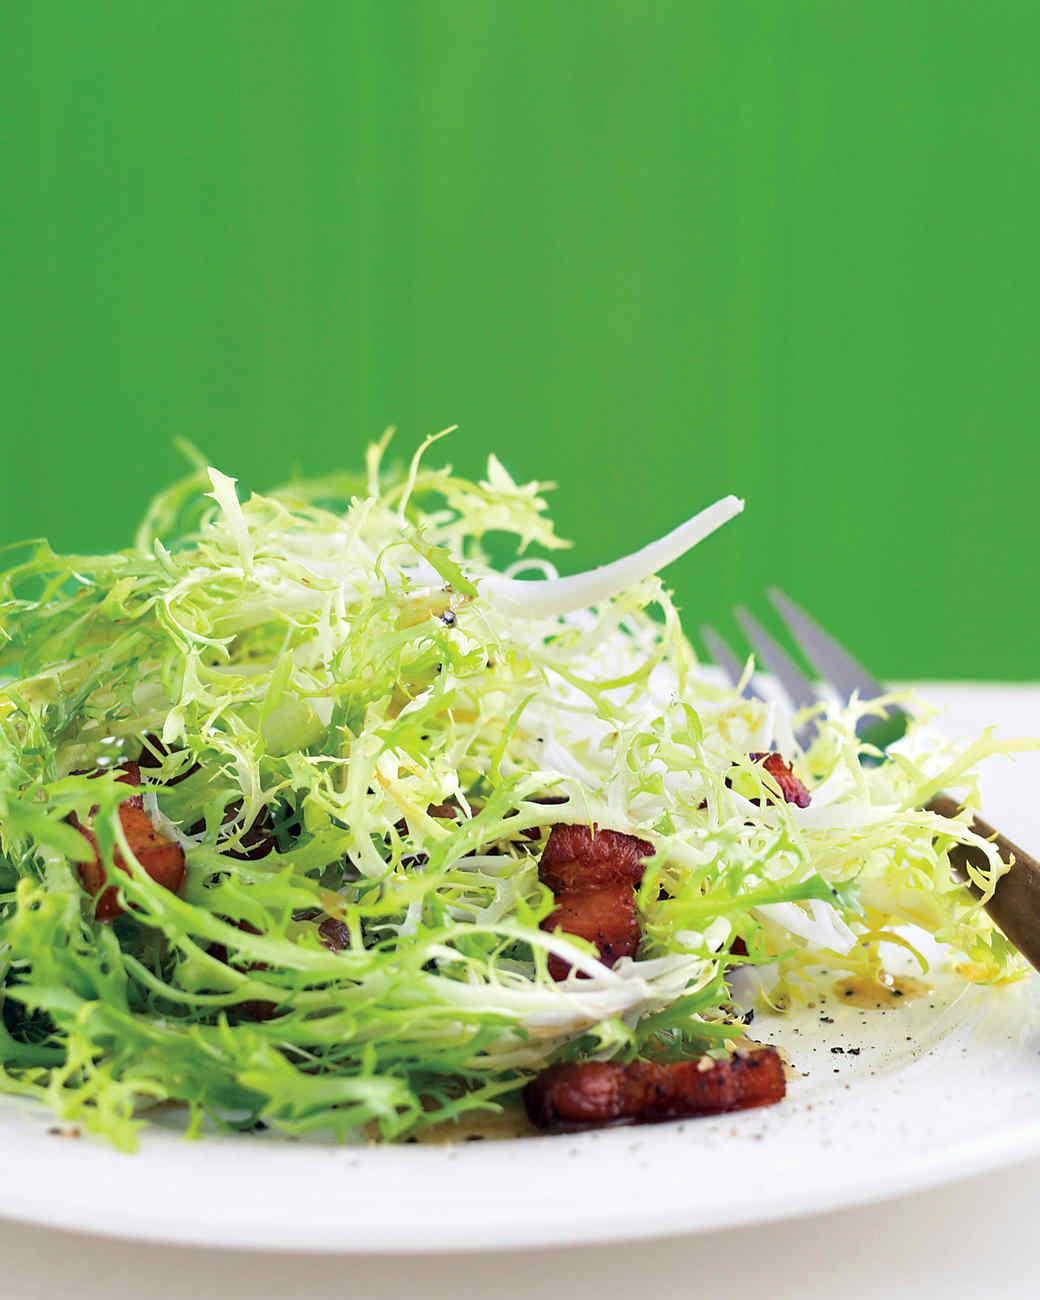 Frisee Salad with Warm Bacon Vinaigrette